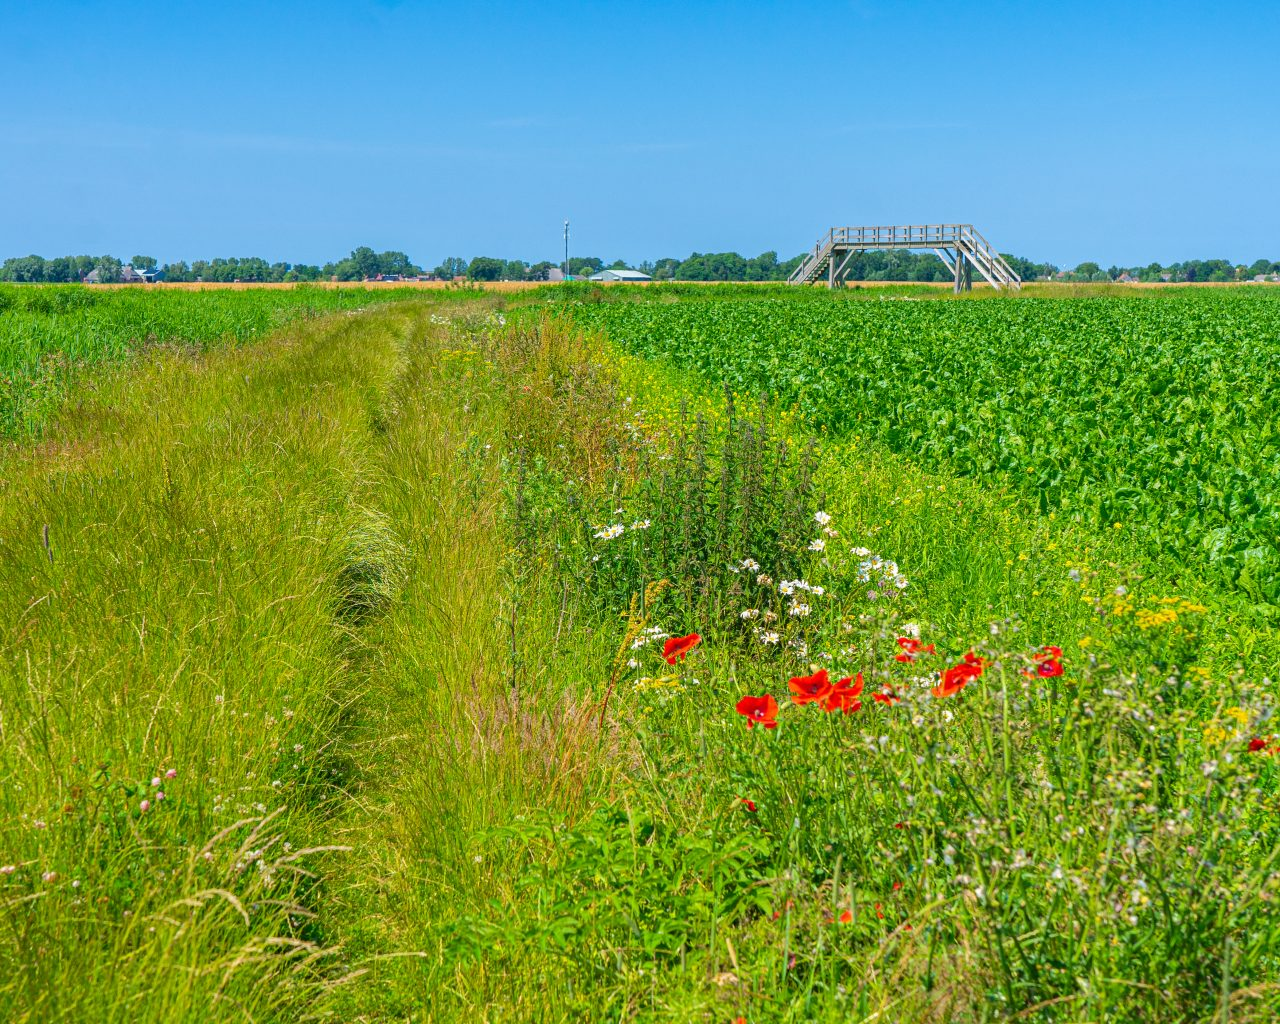 Akkerbloemen-en-hoog-gras-Pieterpad-etappe-1